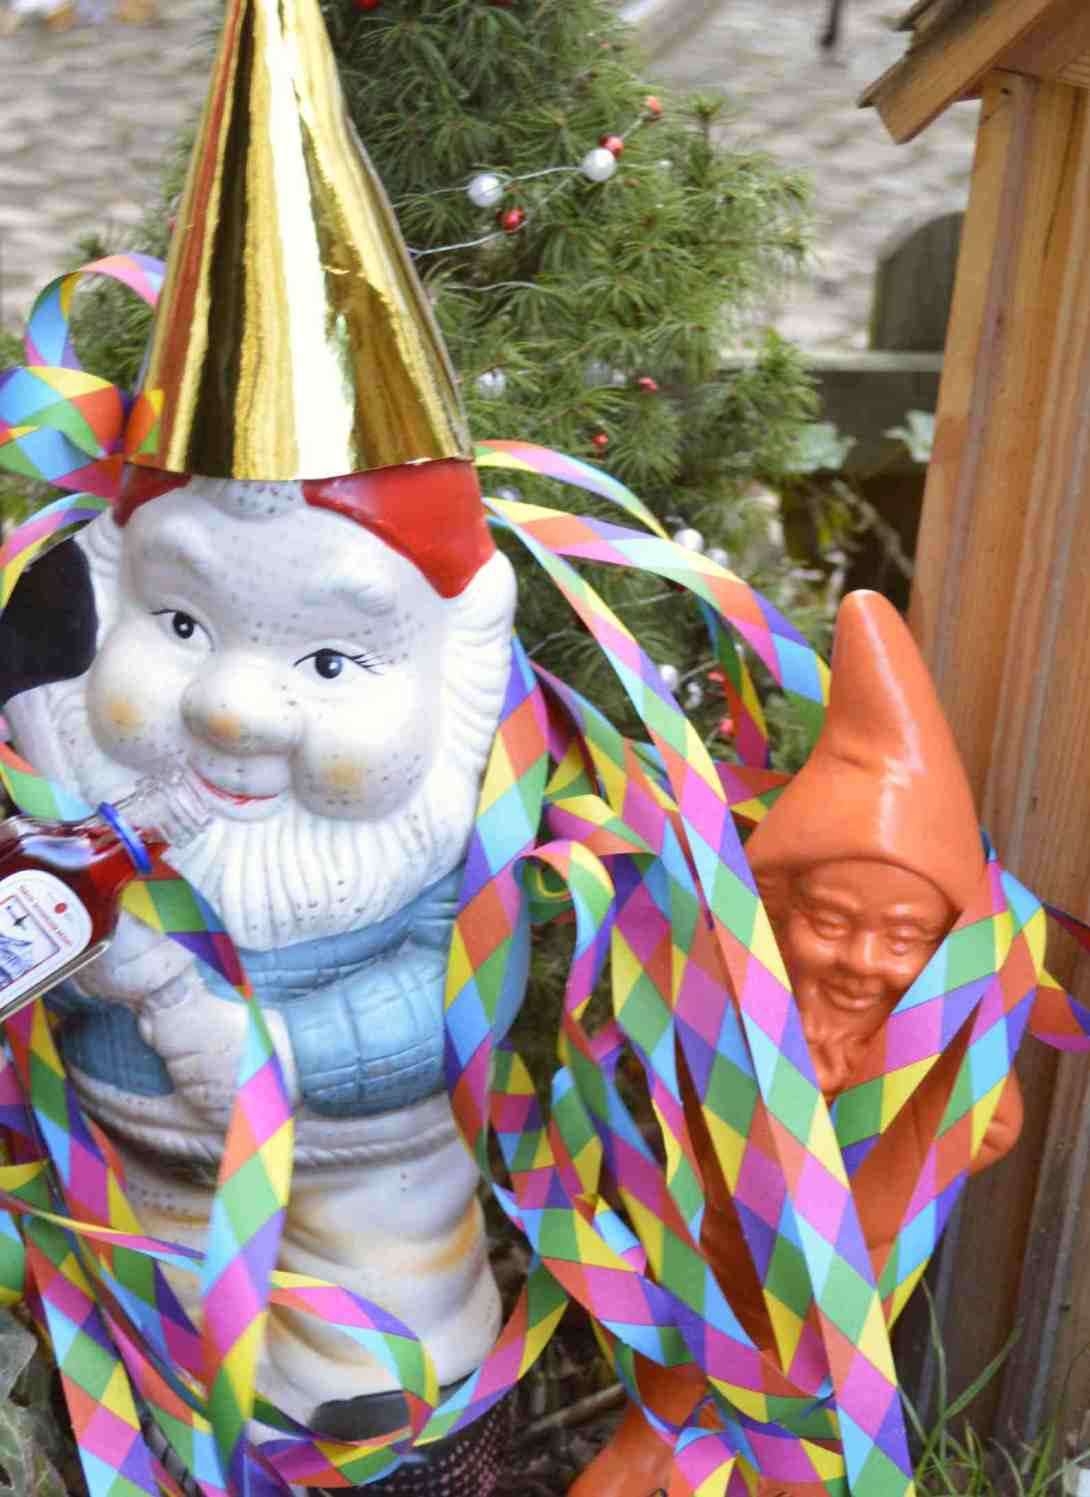 Happy New Year with the gnomes from berlin Heinrich der Gartenzwerrg Paul Joost be kitschig blog